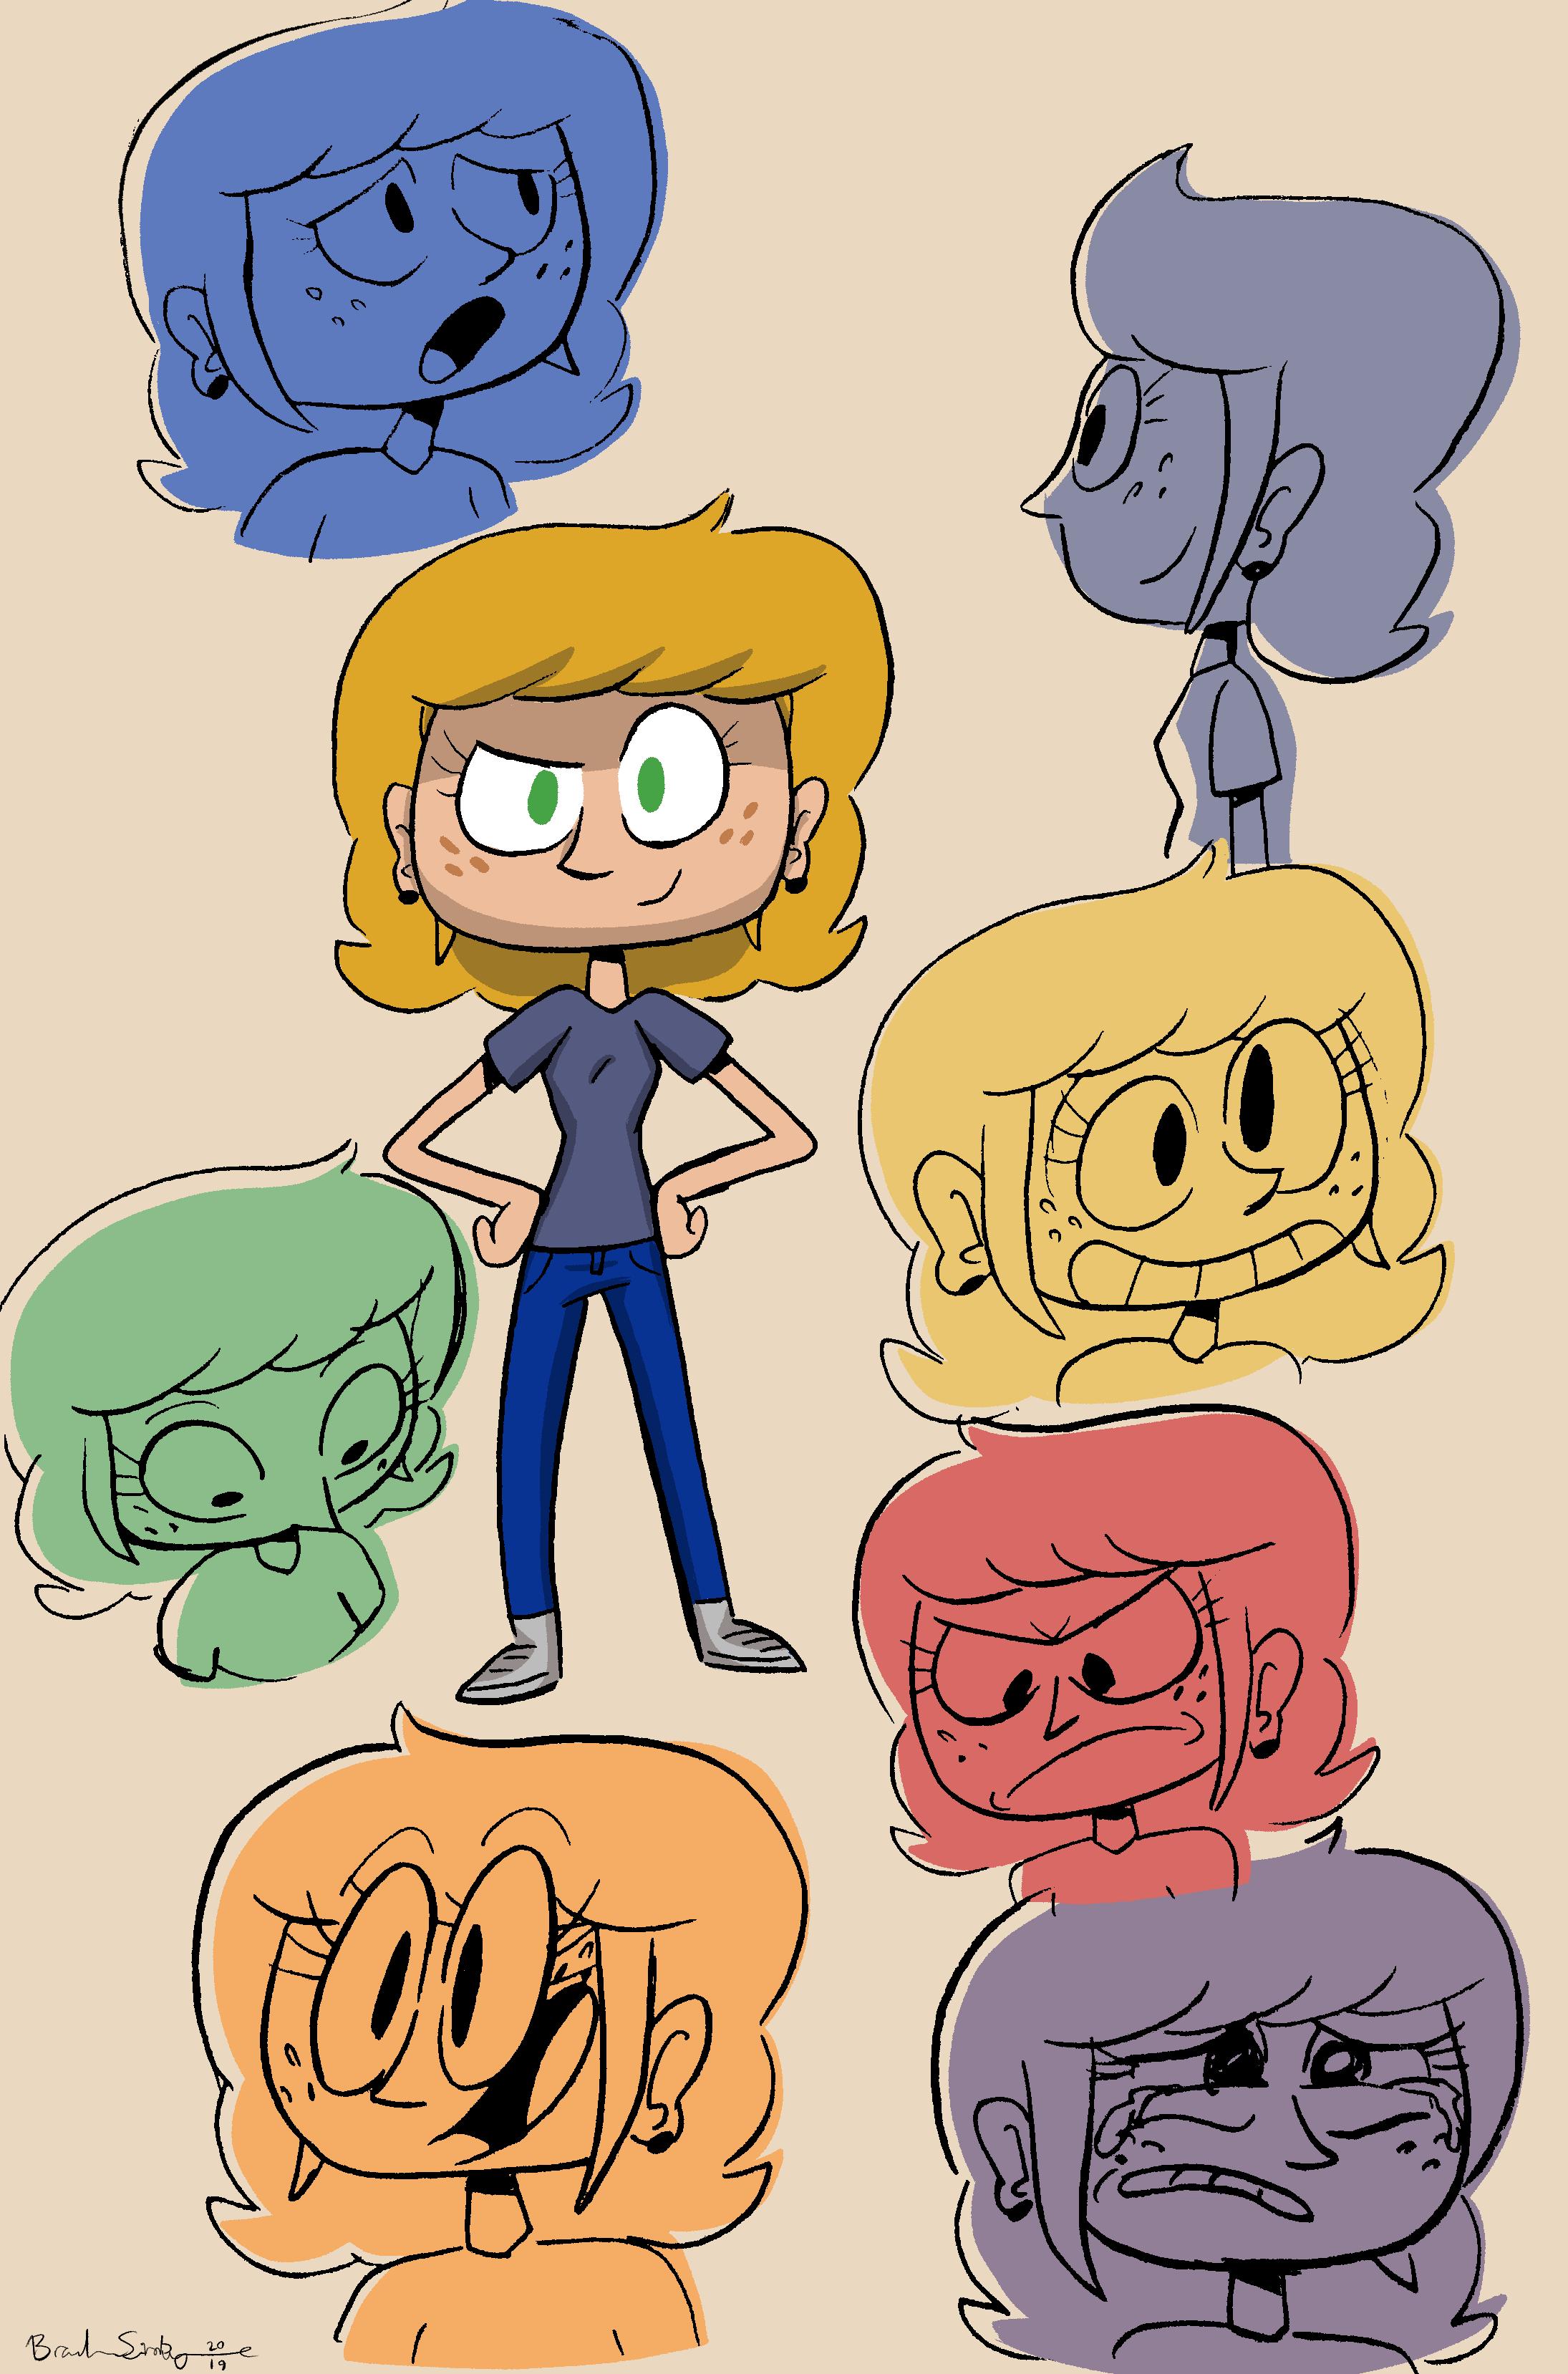 Some Brooks